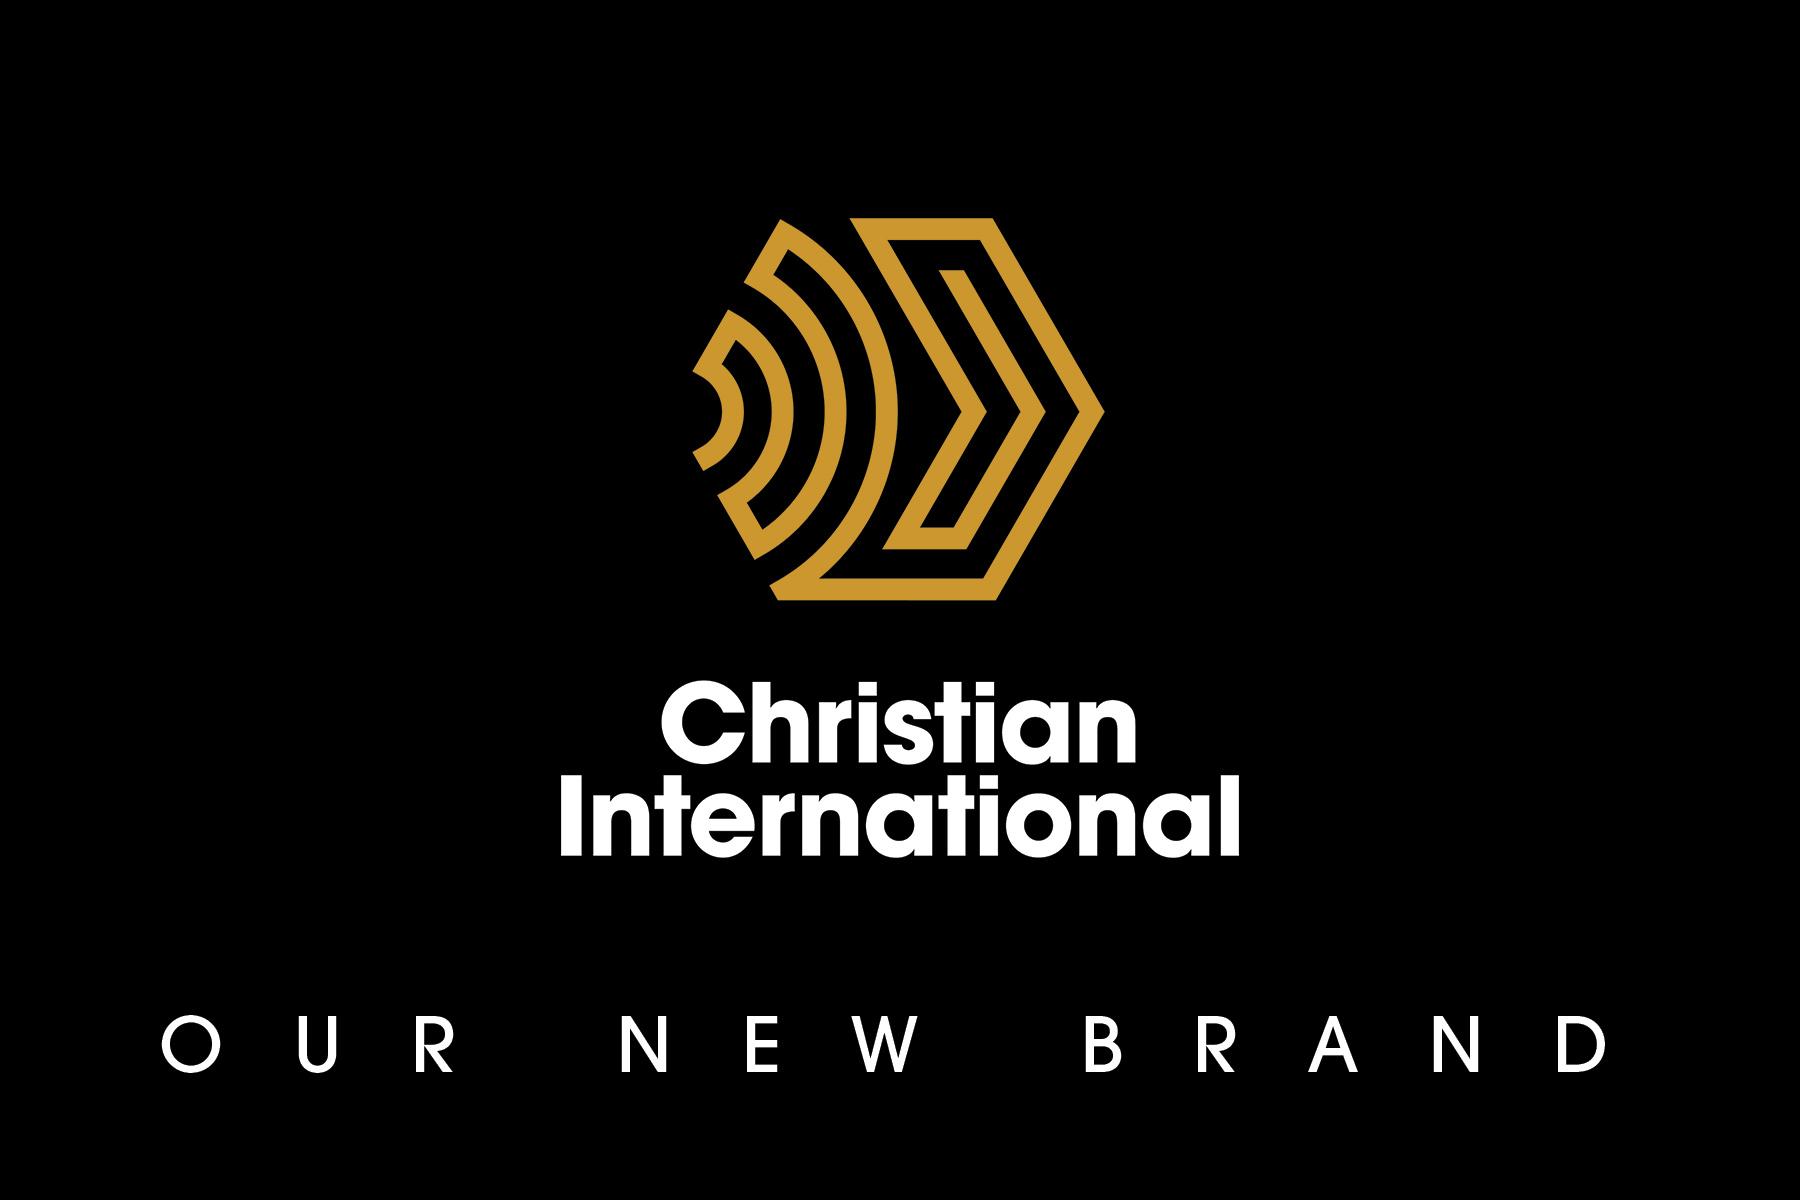 New_Brand.jpg